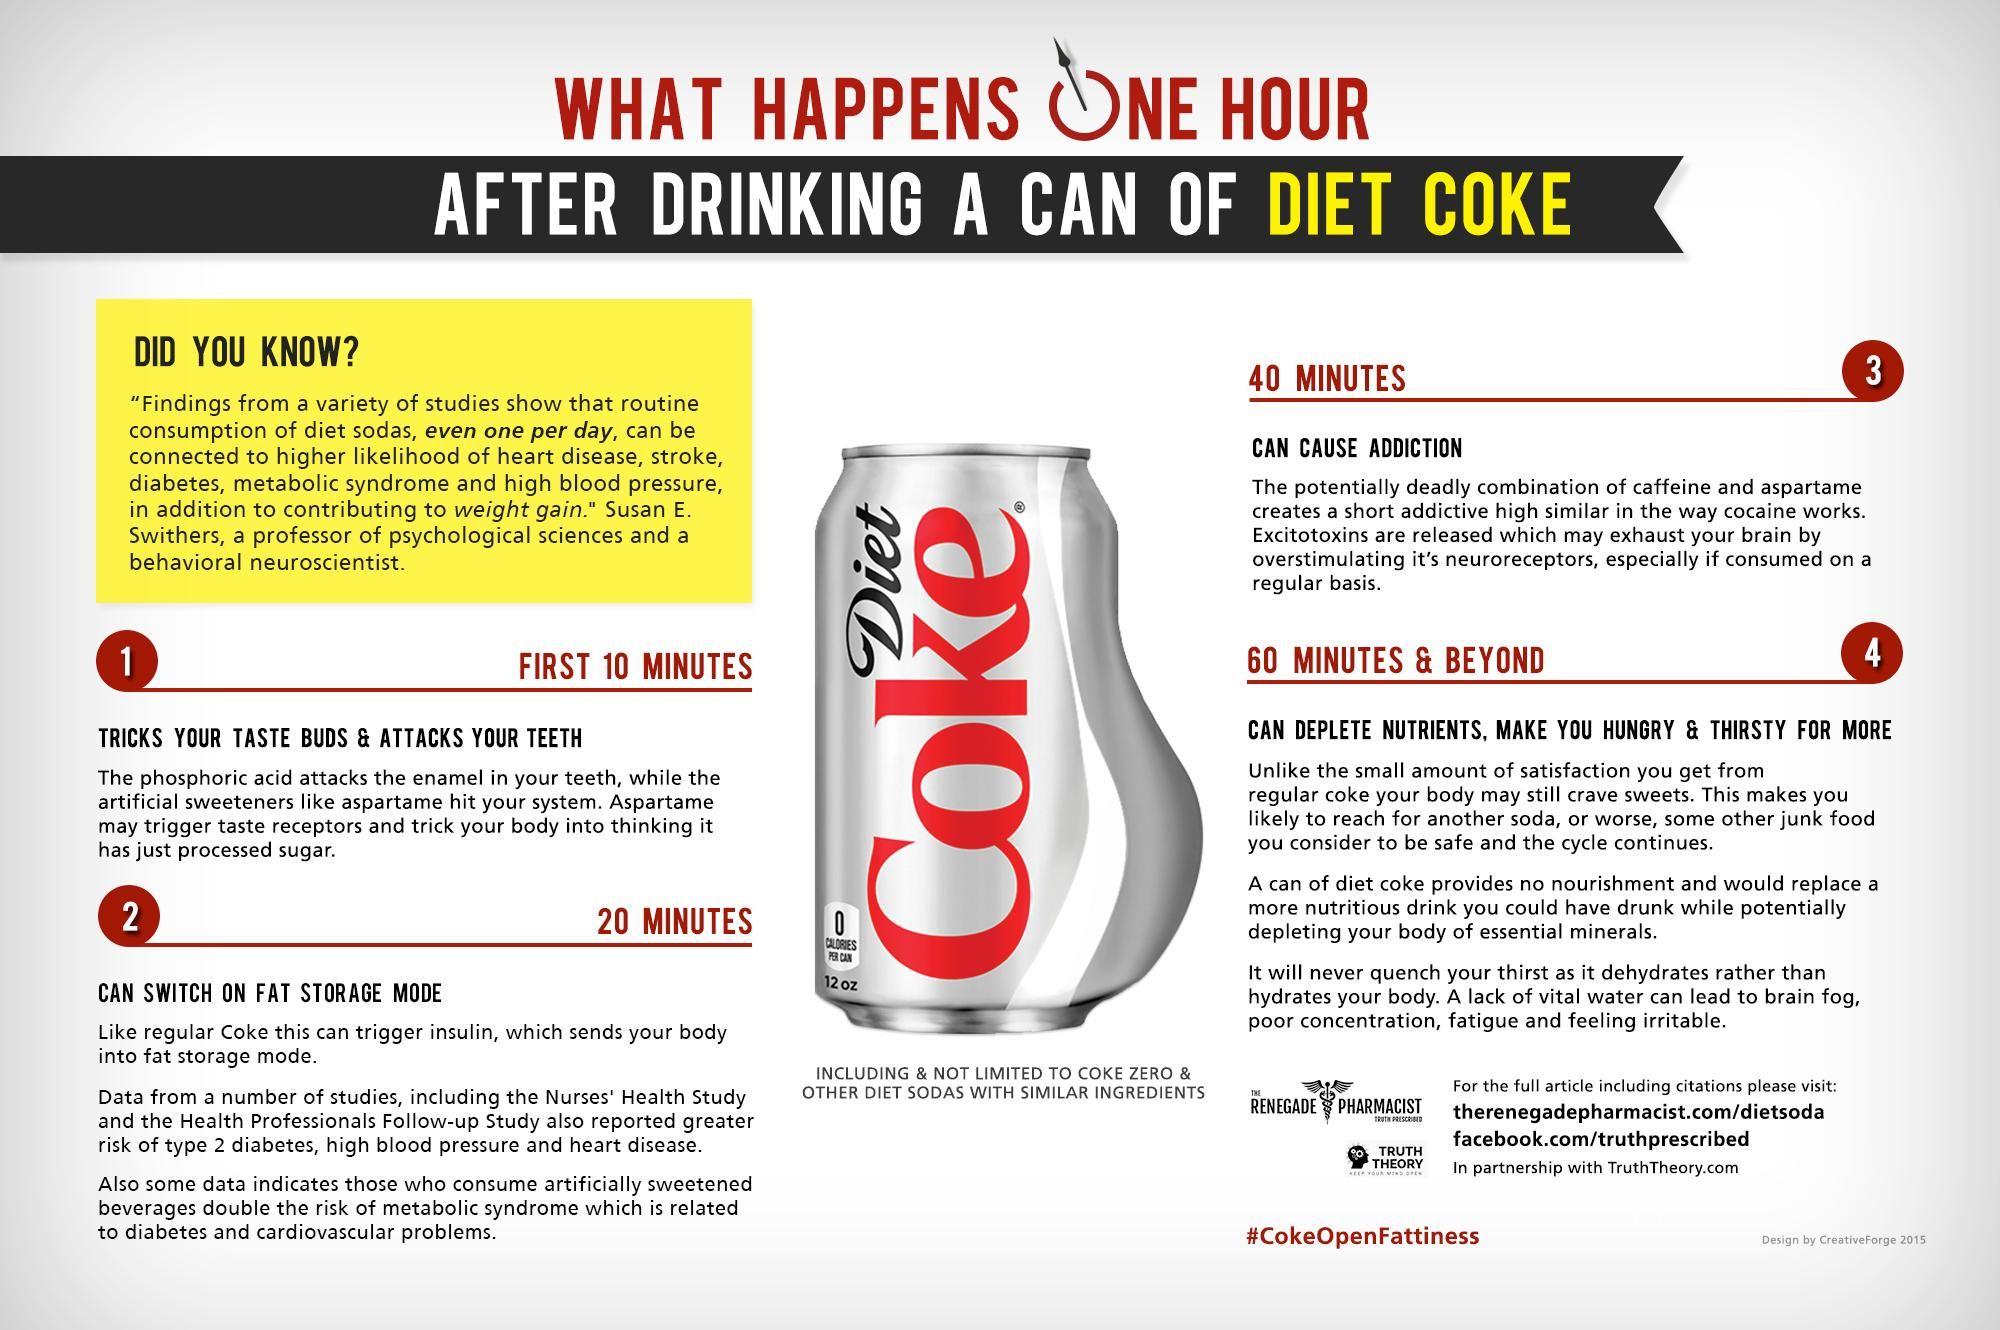 Can You Drink Coke Zero If You Have Diabetes?